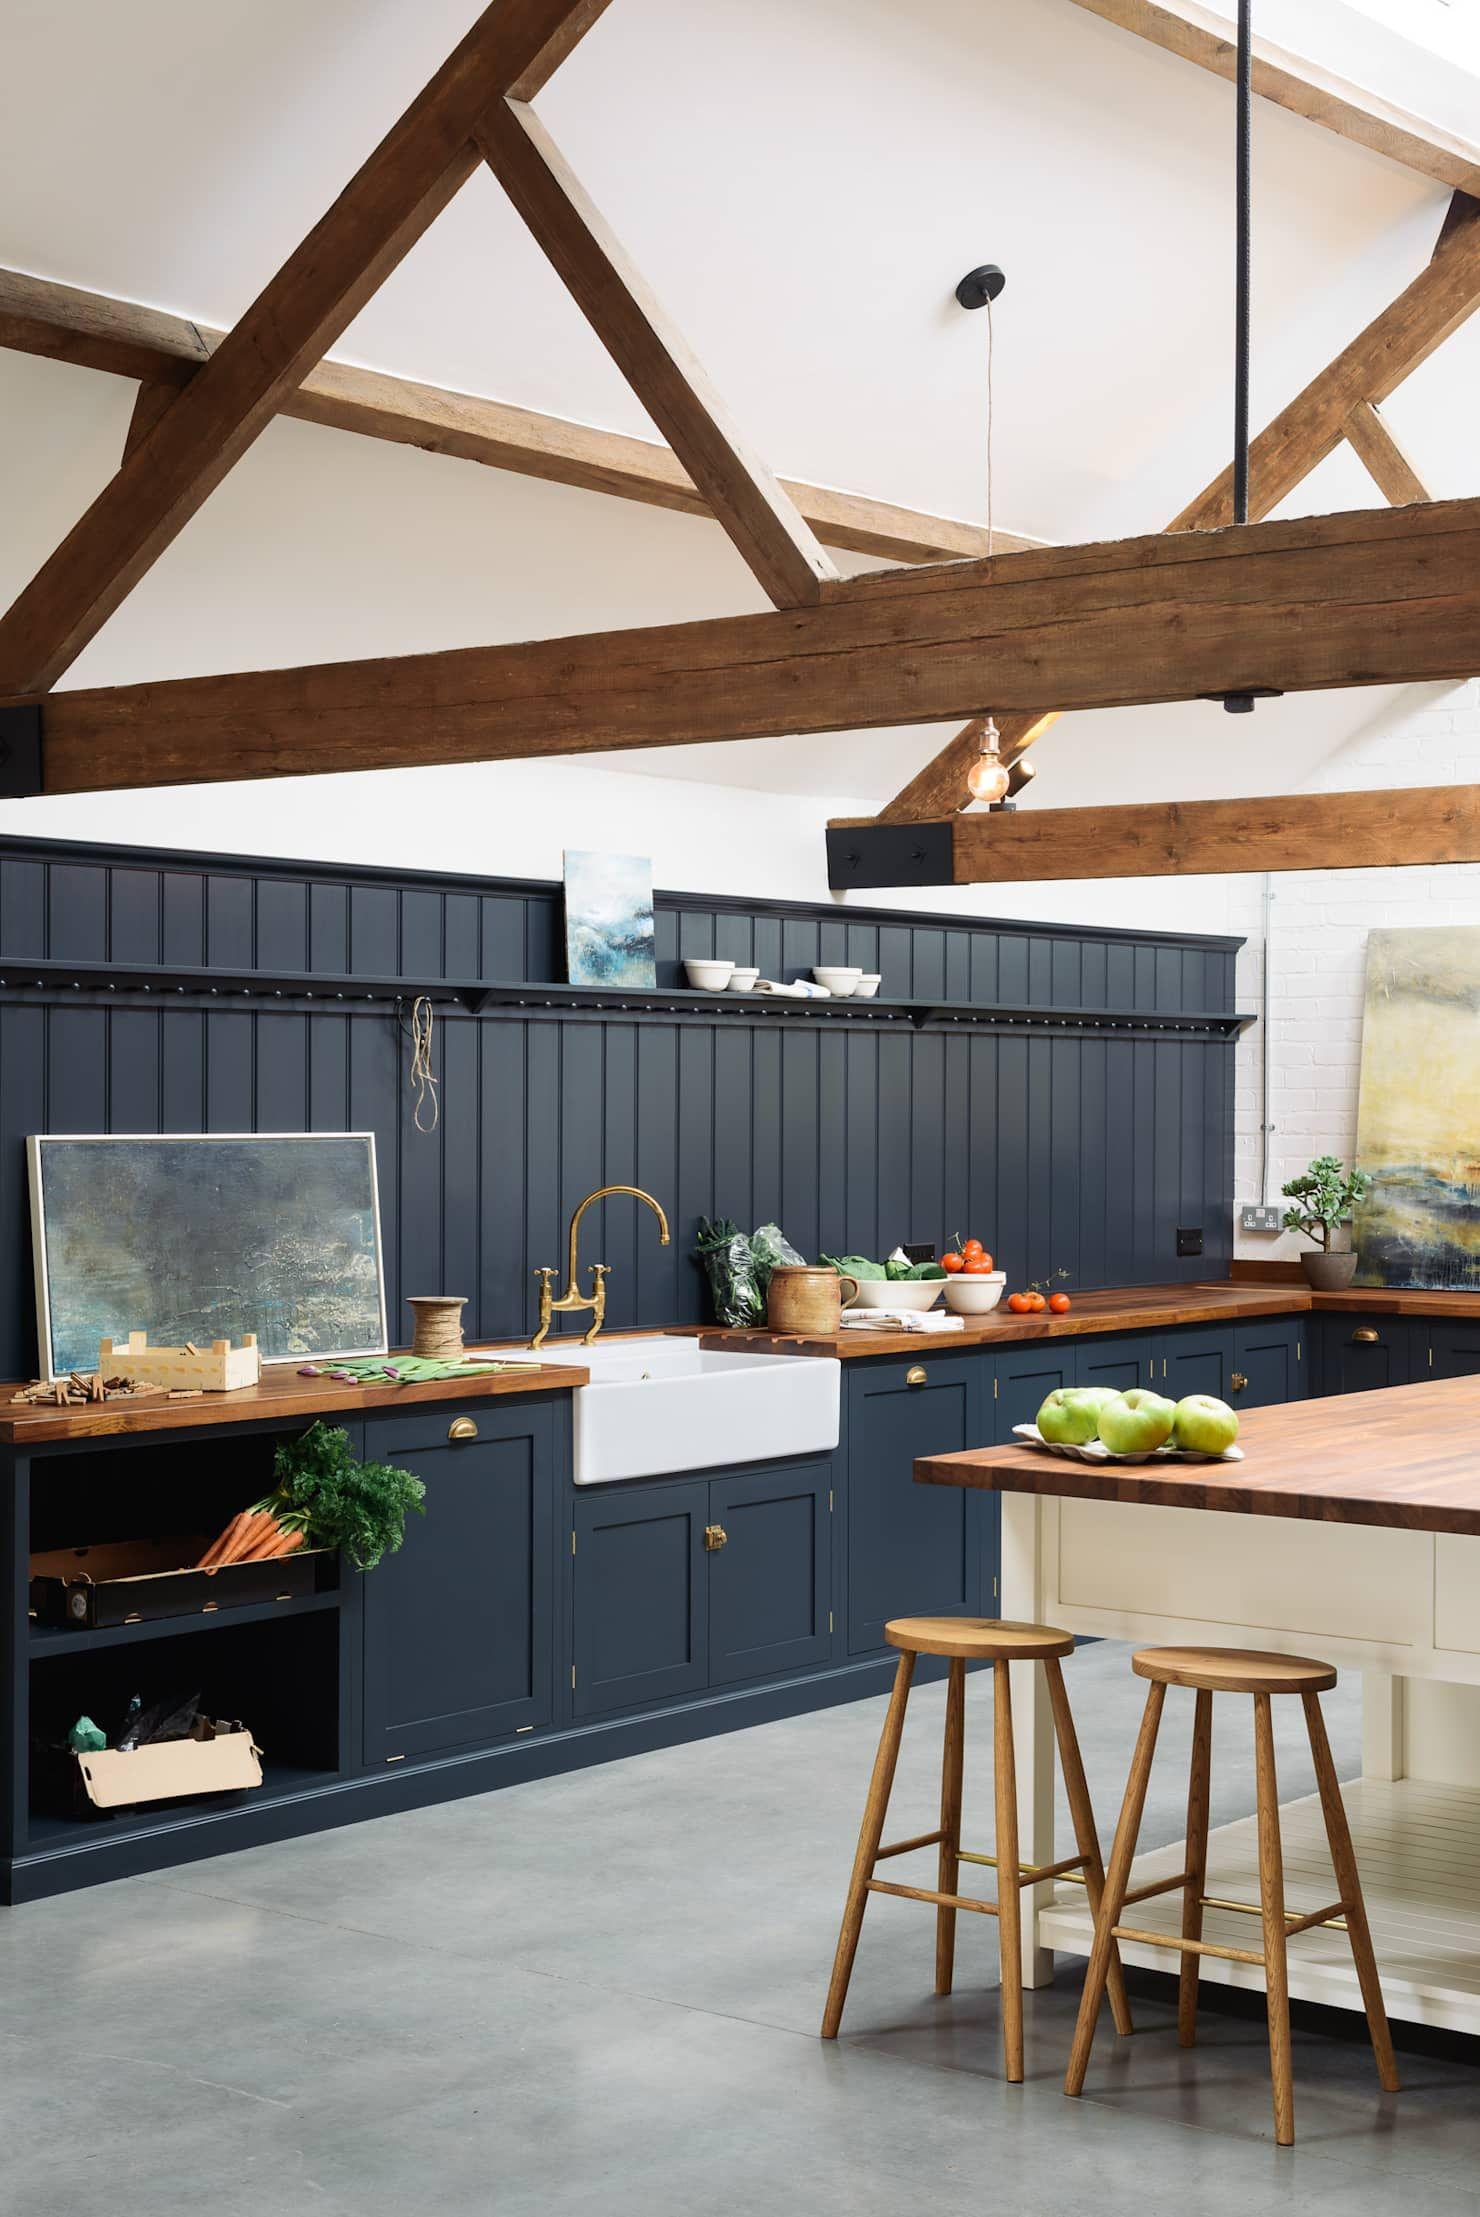 The Cattle Shed Kitchen North Norfolk Country Kitchen By Devol Kitchens Interior Design Kitchen Devol Kitchens Kitchen Interior